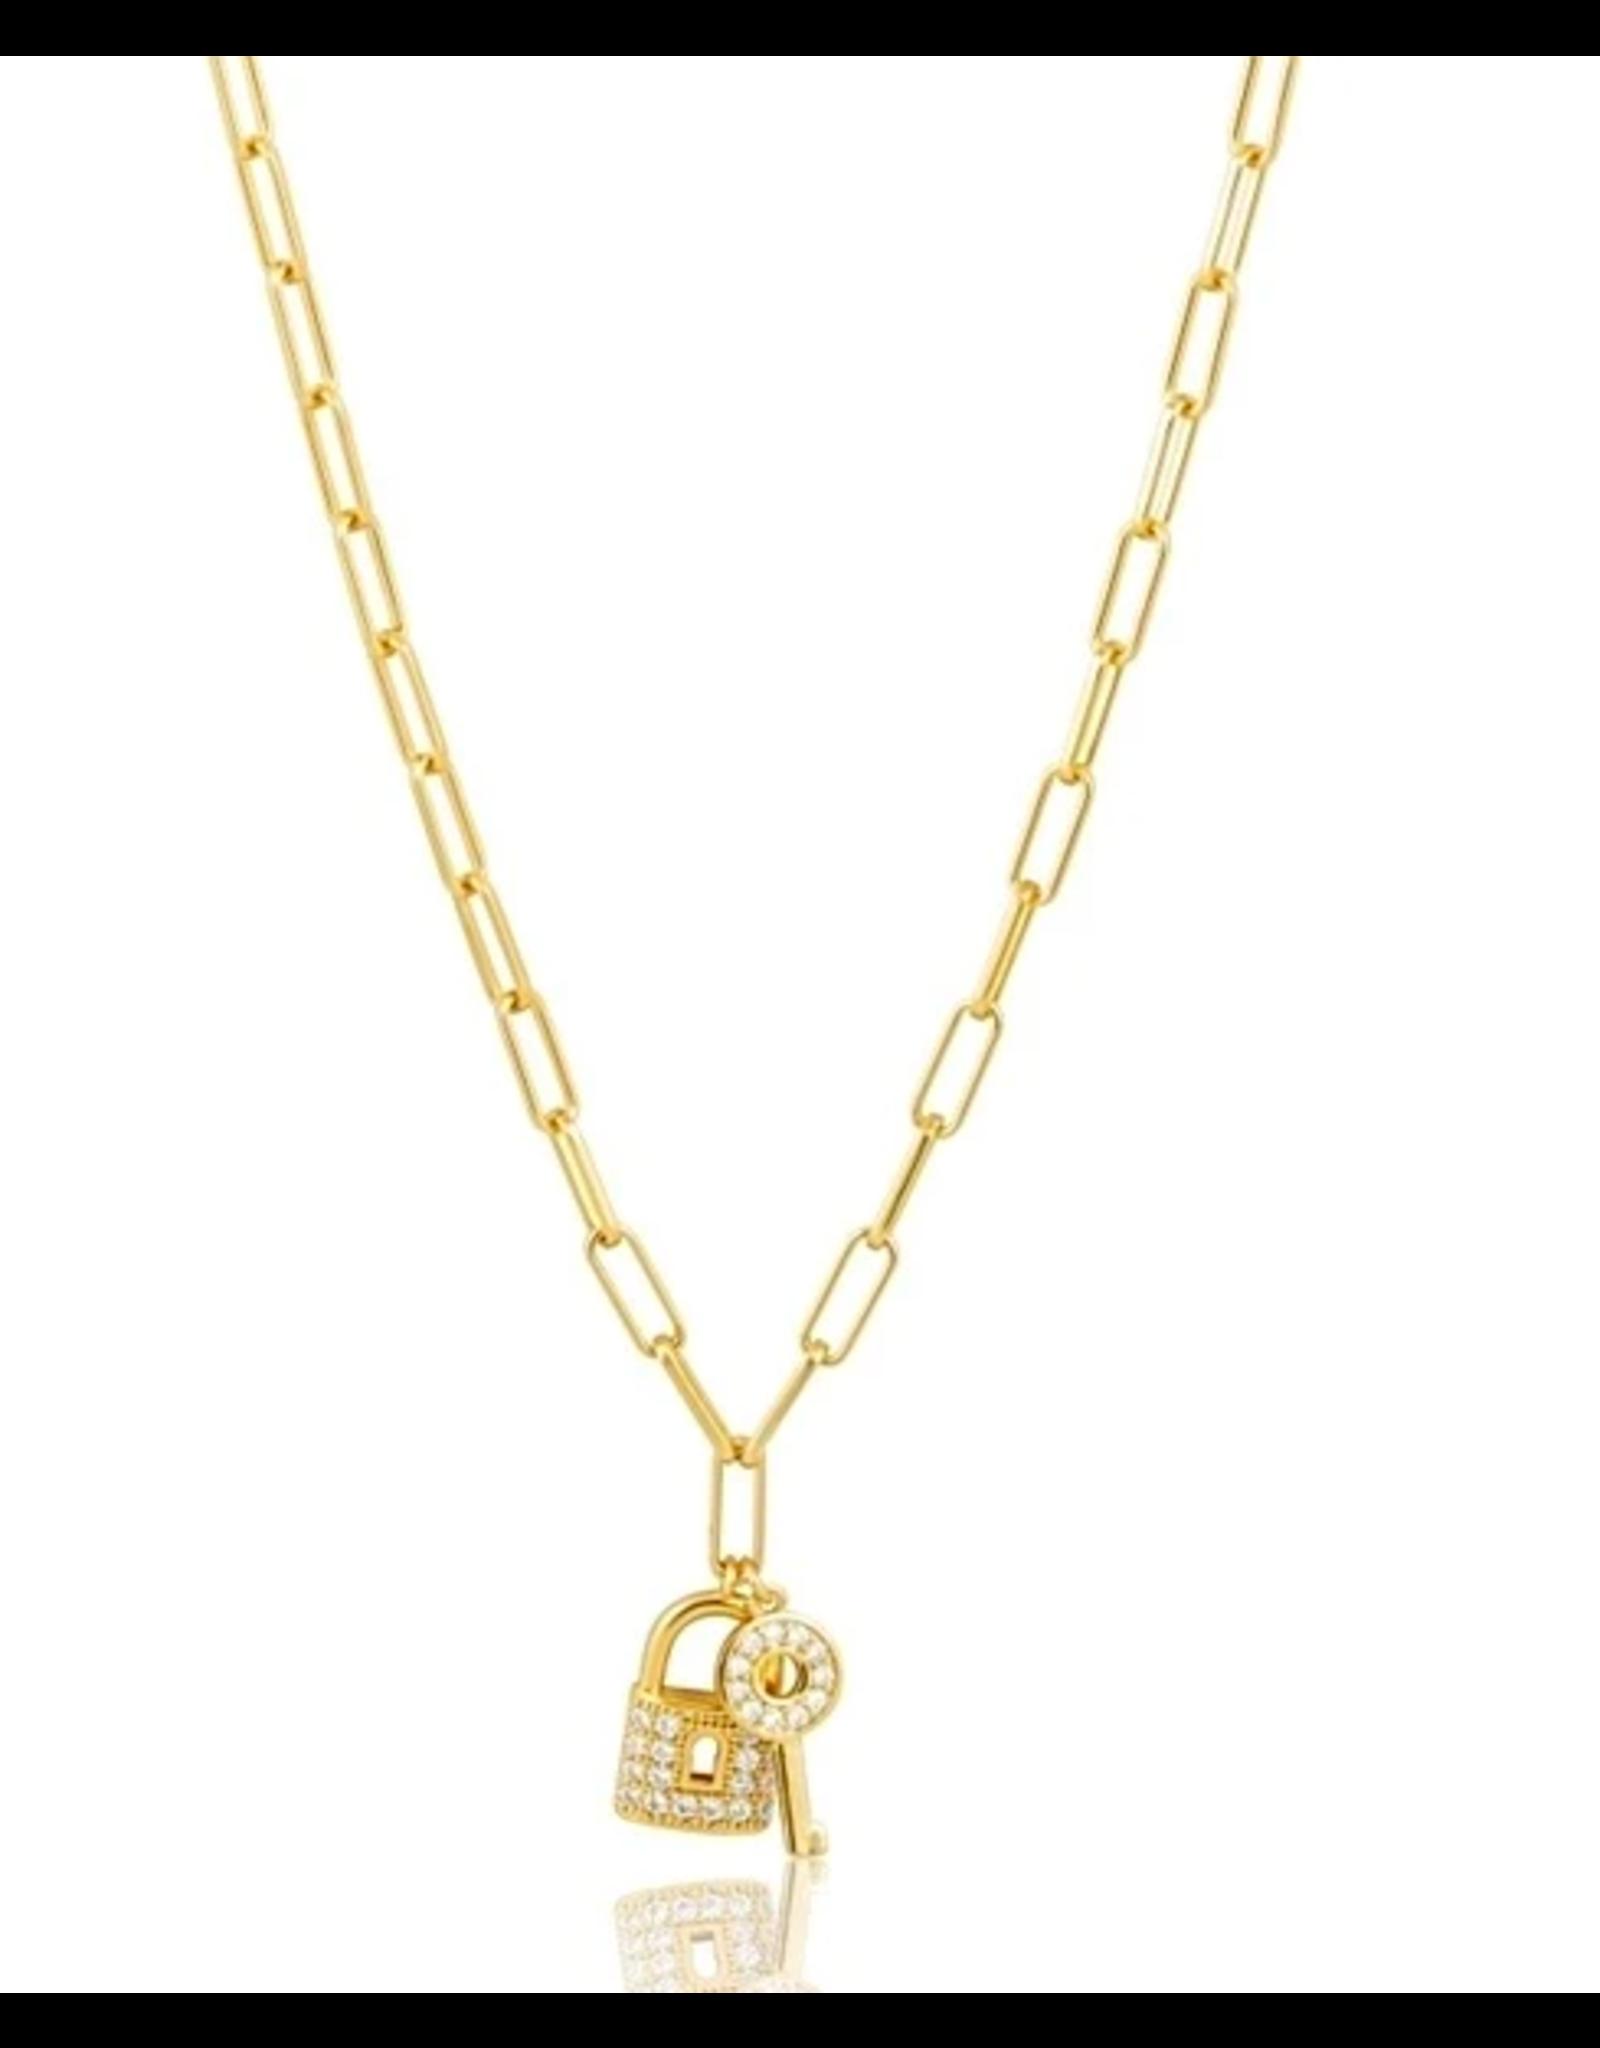 Sahira Jewelry Amore Necklace